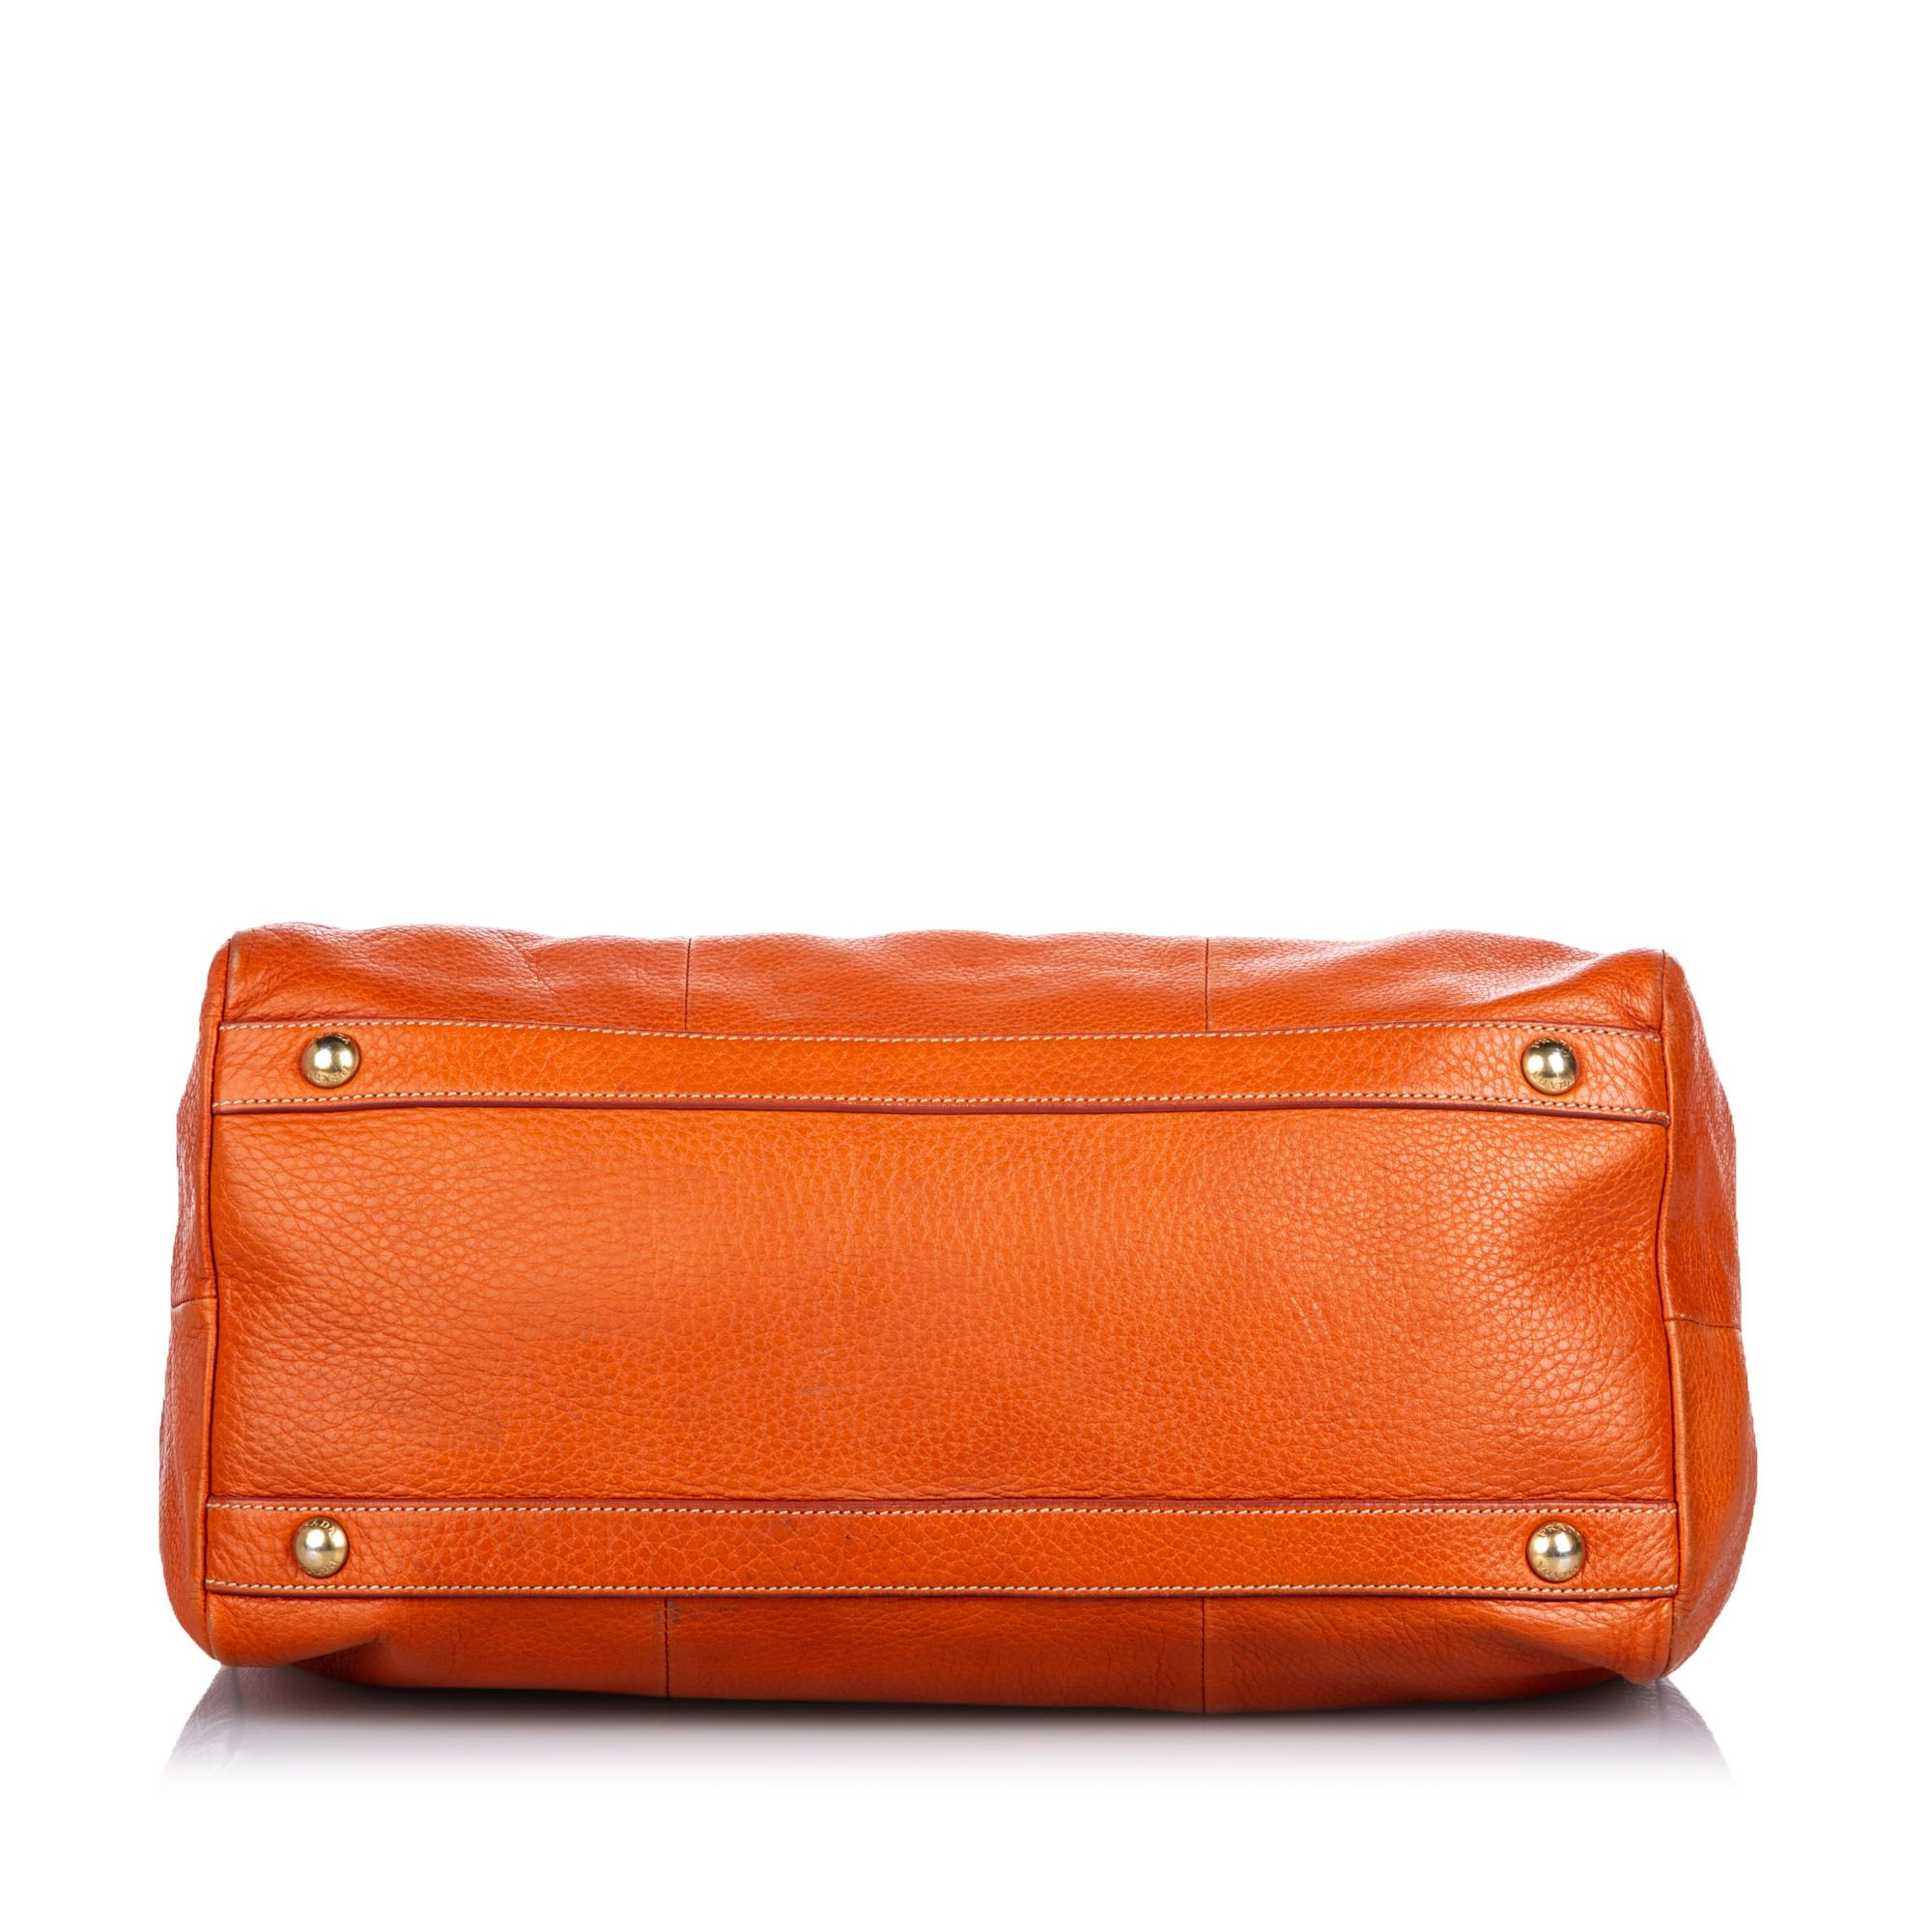 Vintage Prada Vitello Daino Satchel Orange